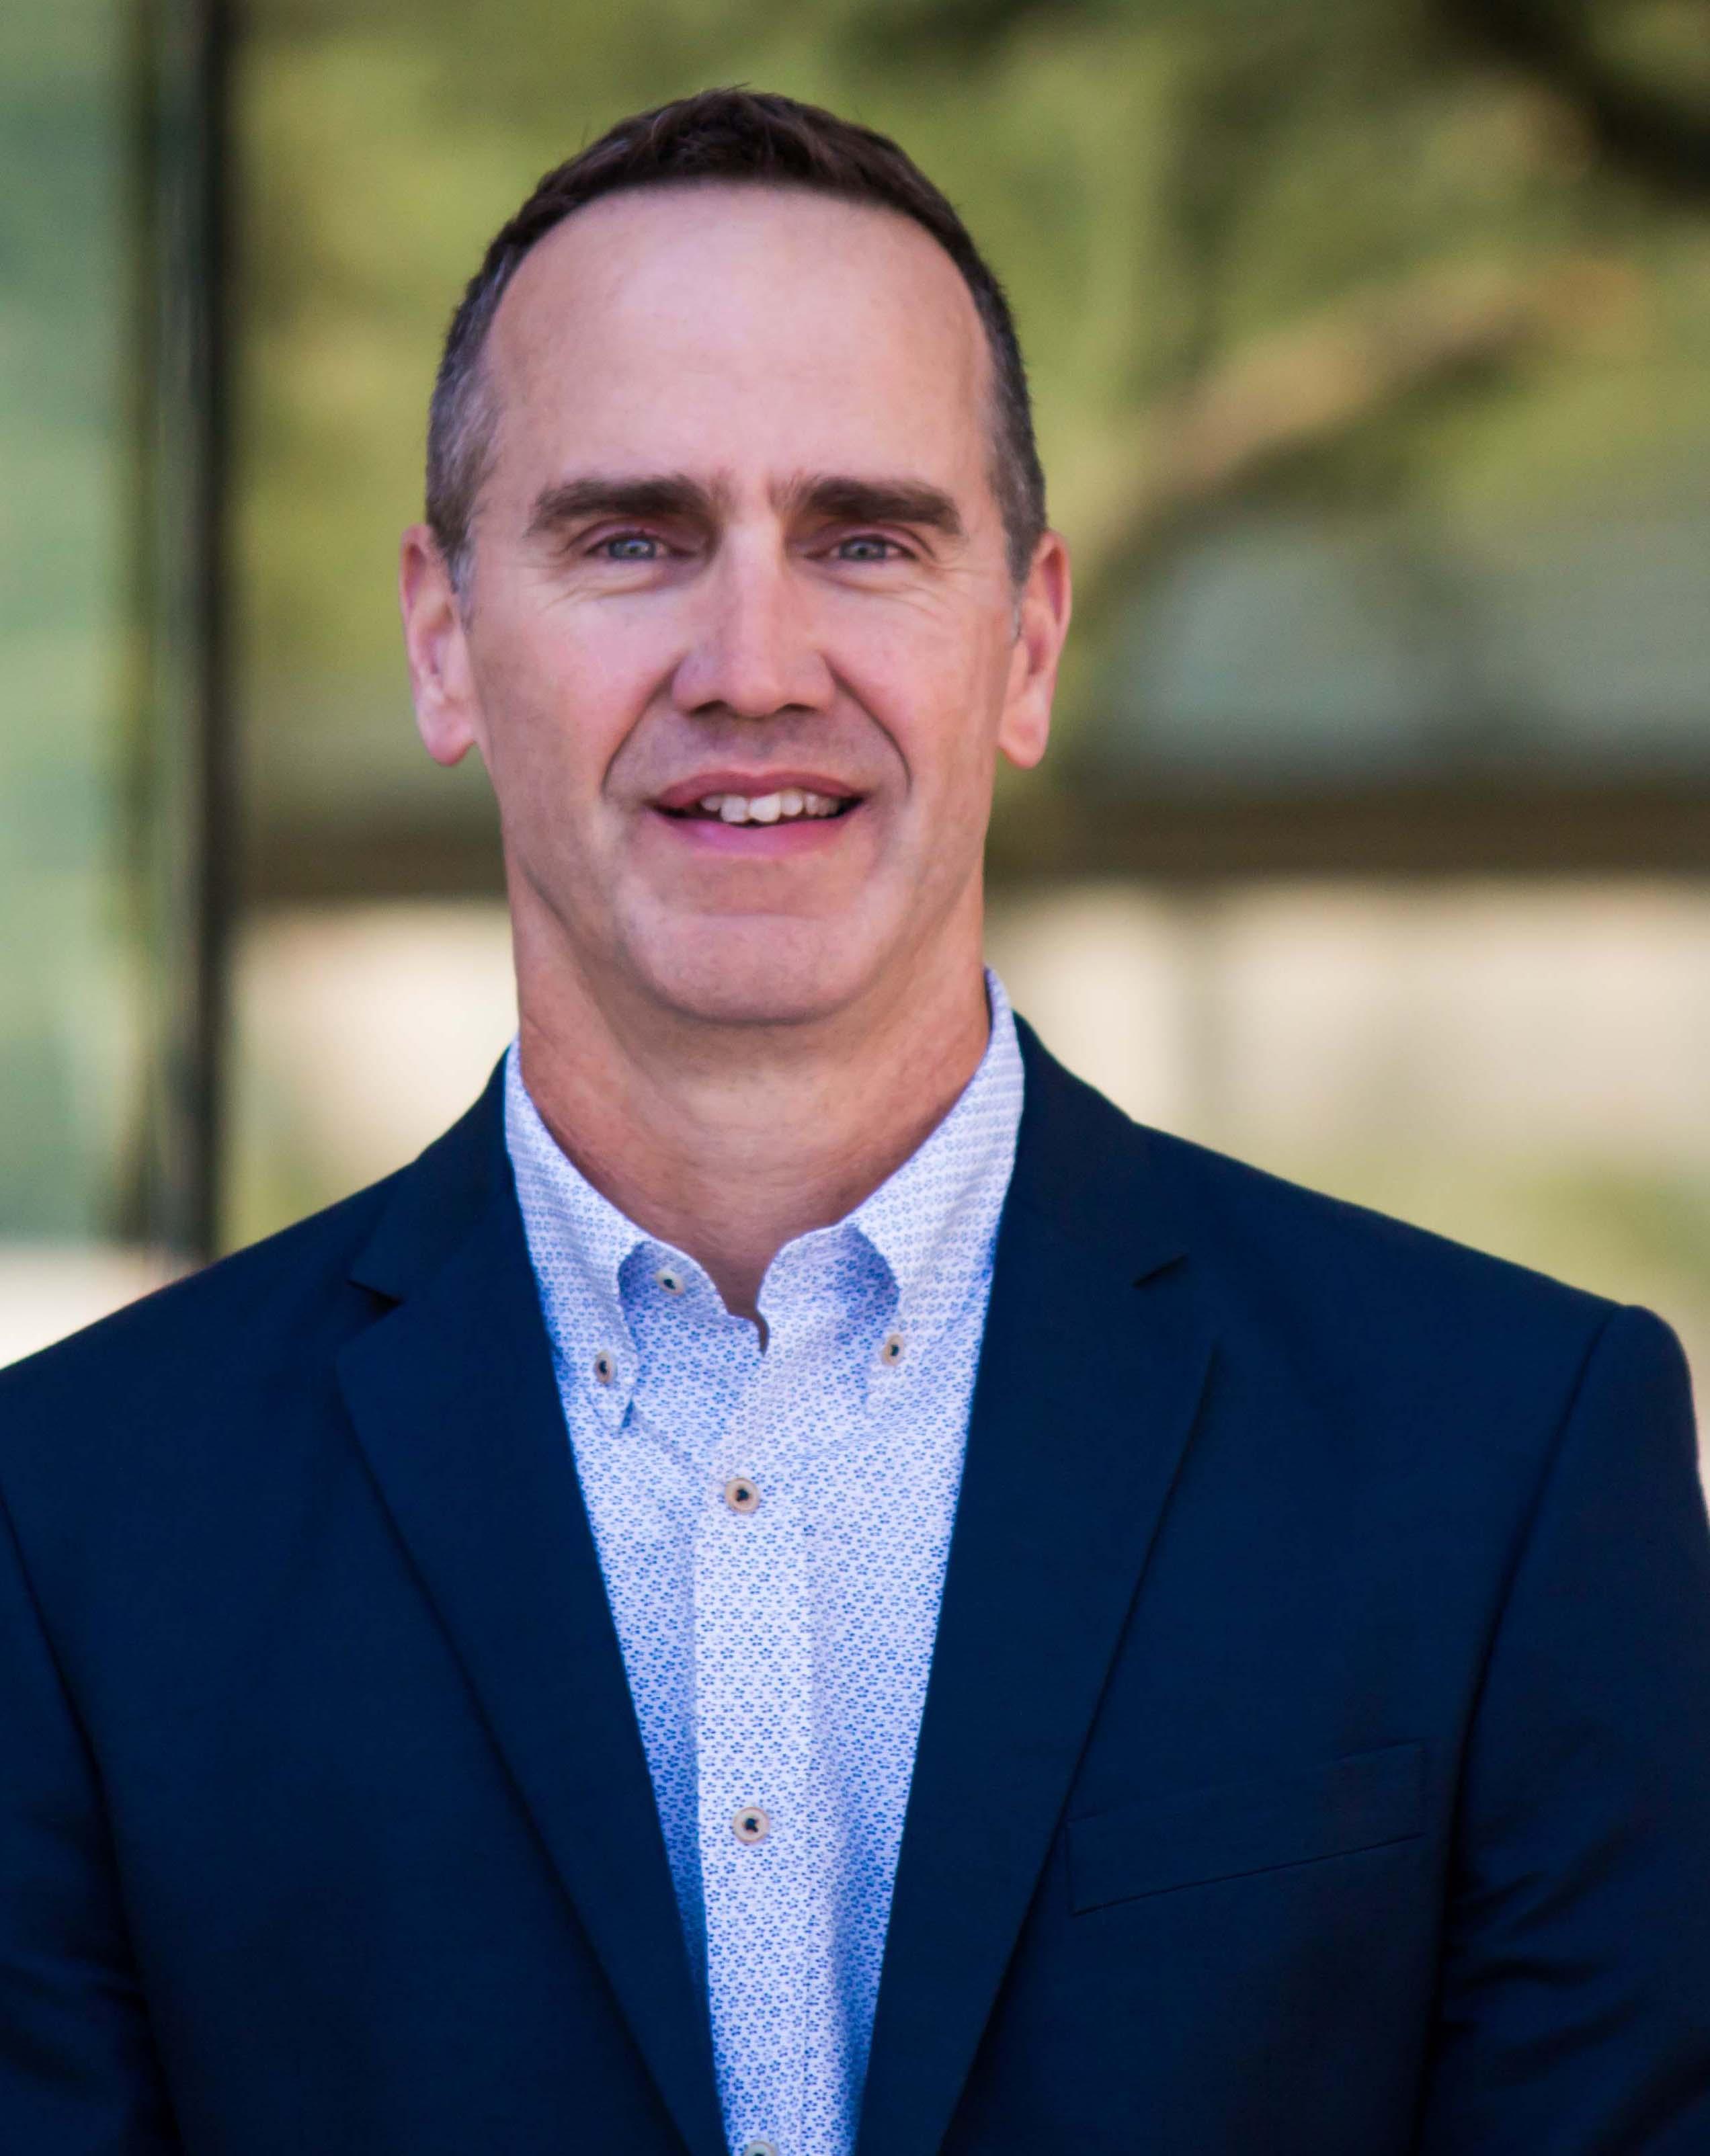 Steve Sleeper, PBA Executive Director